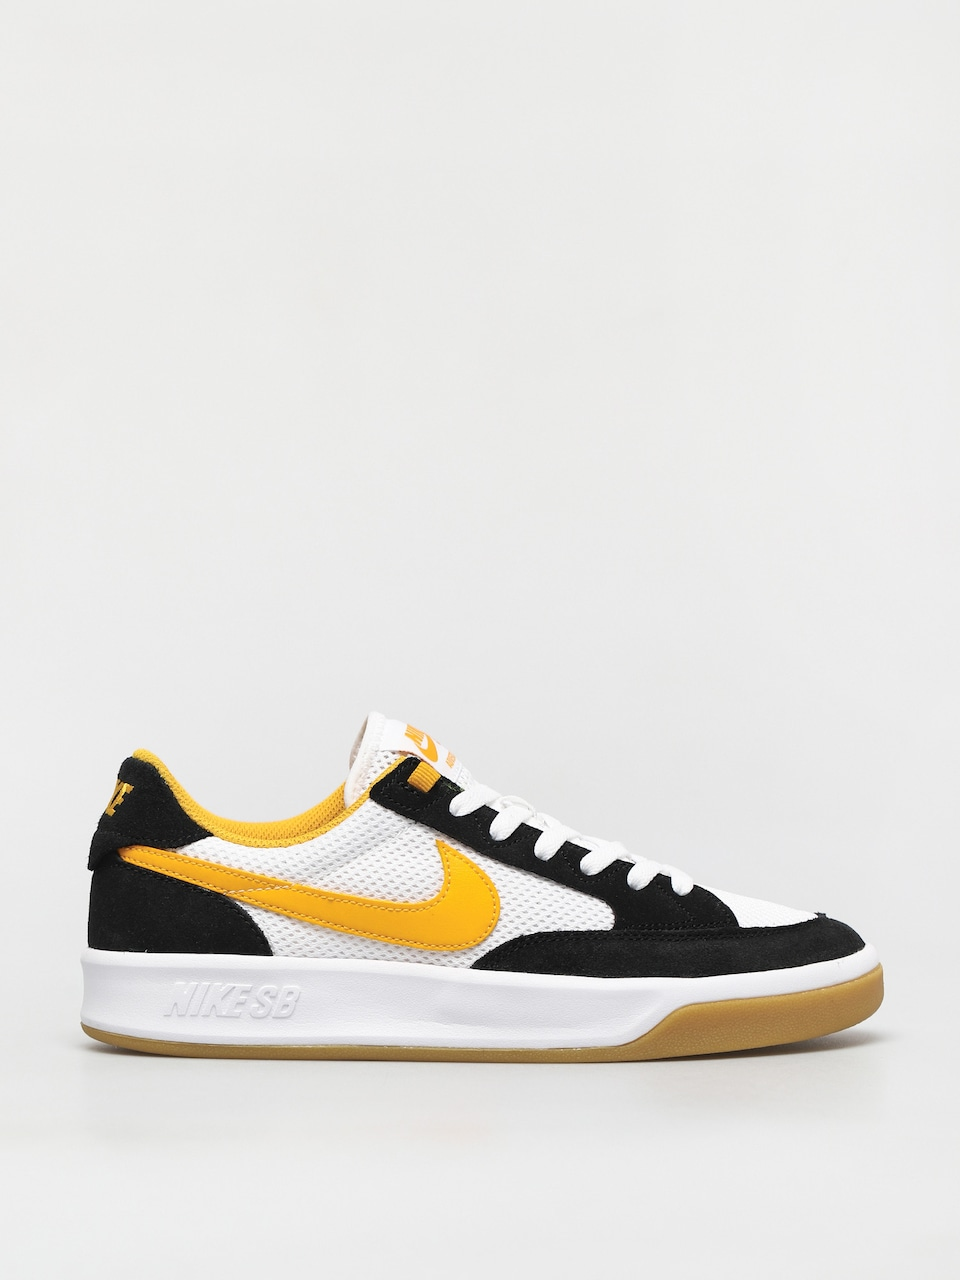 Nike SB Adversary Shoes (black/university gold white)